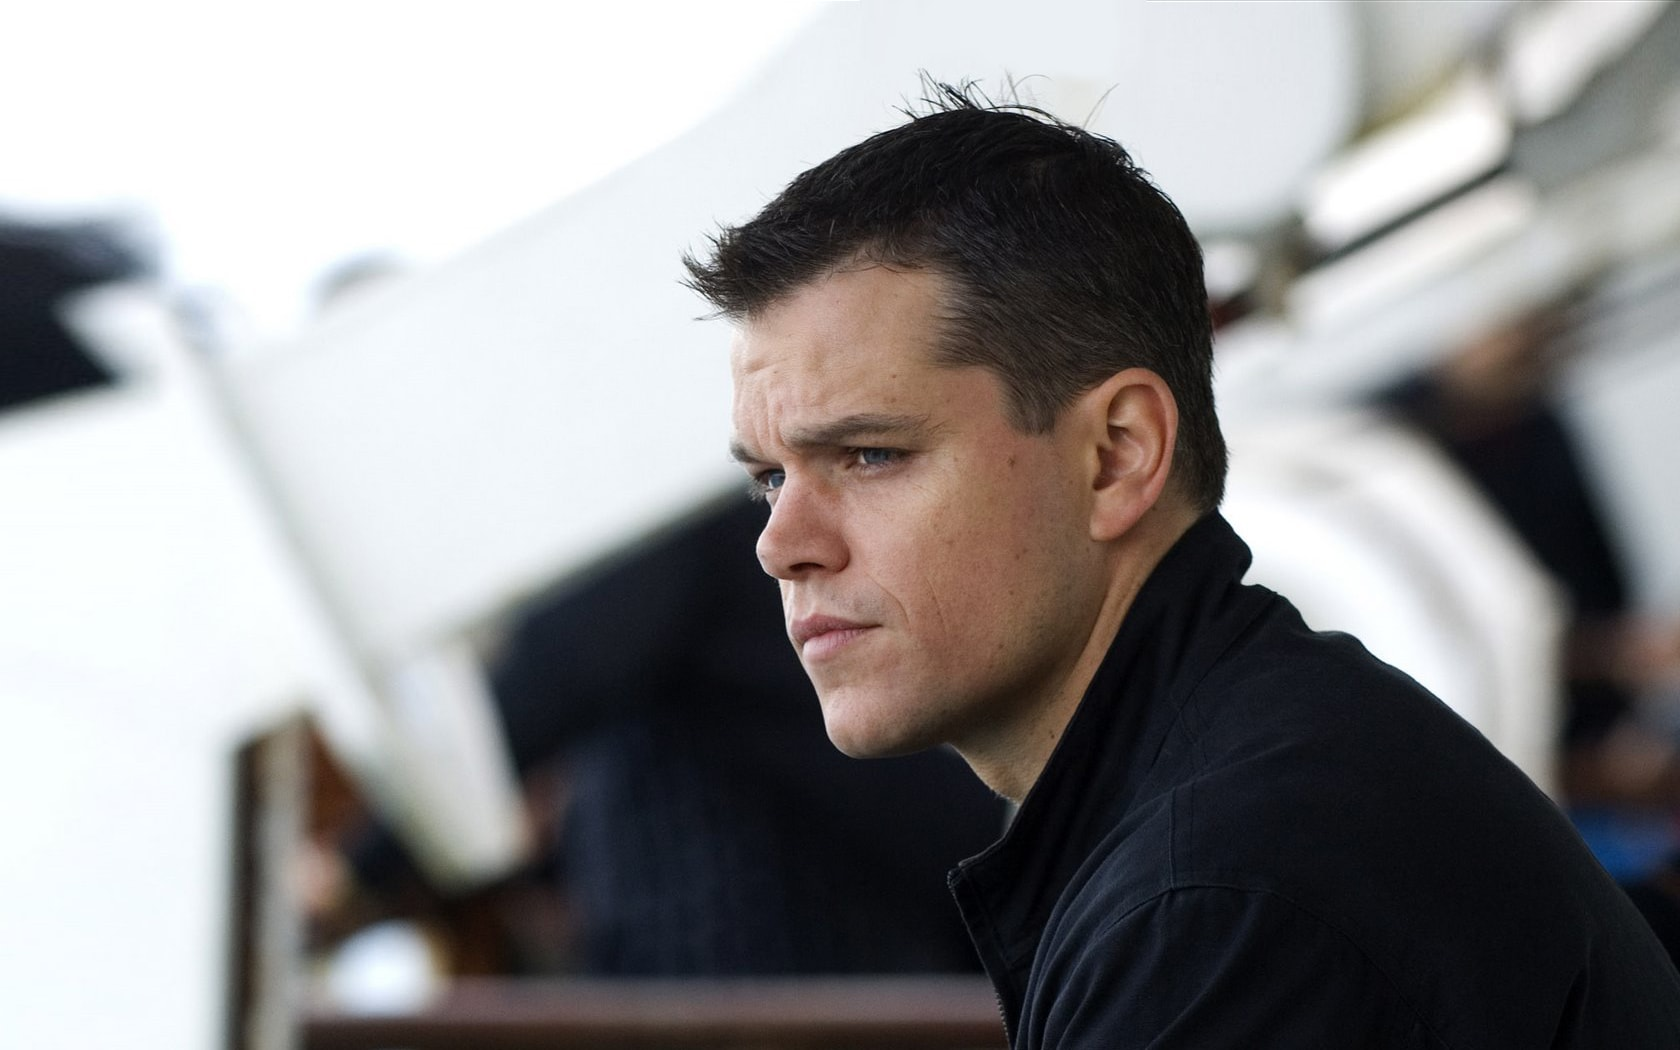 Untitled Jeremy Renner/Bourne Sequel Free